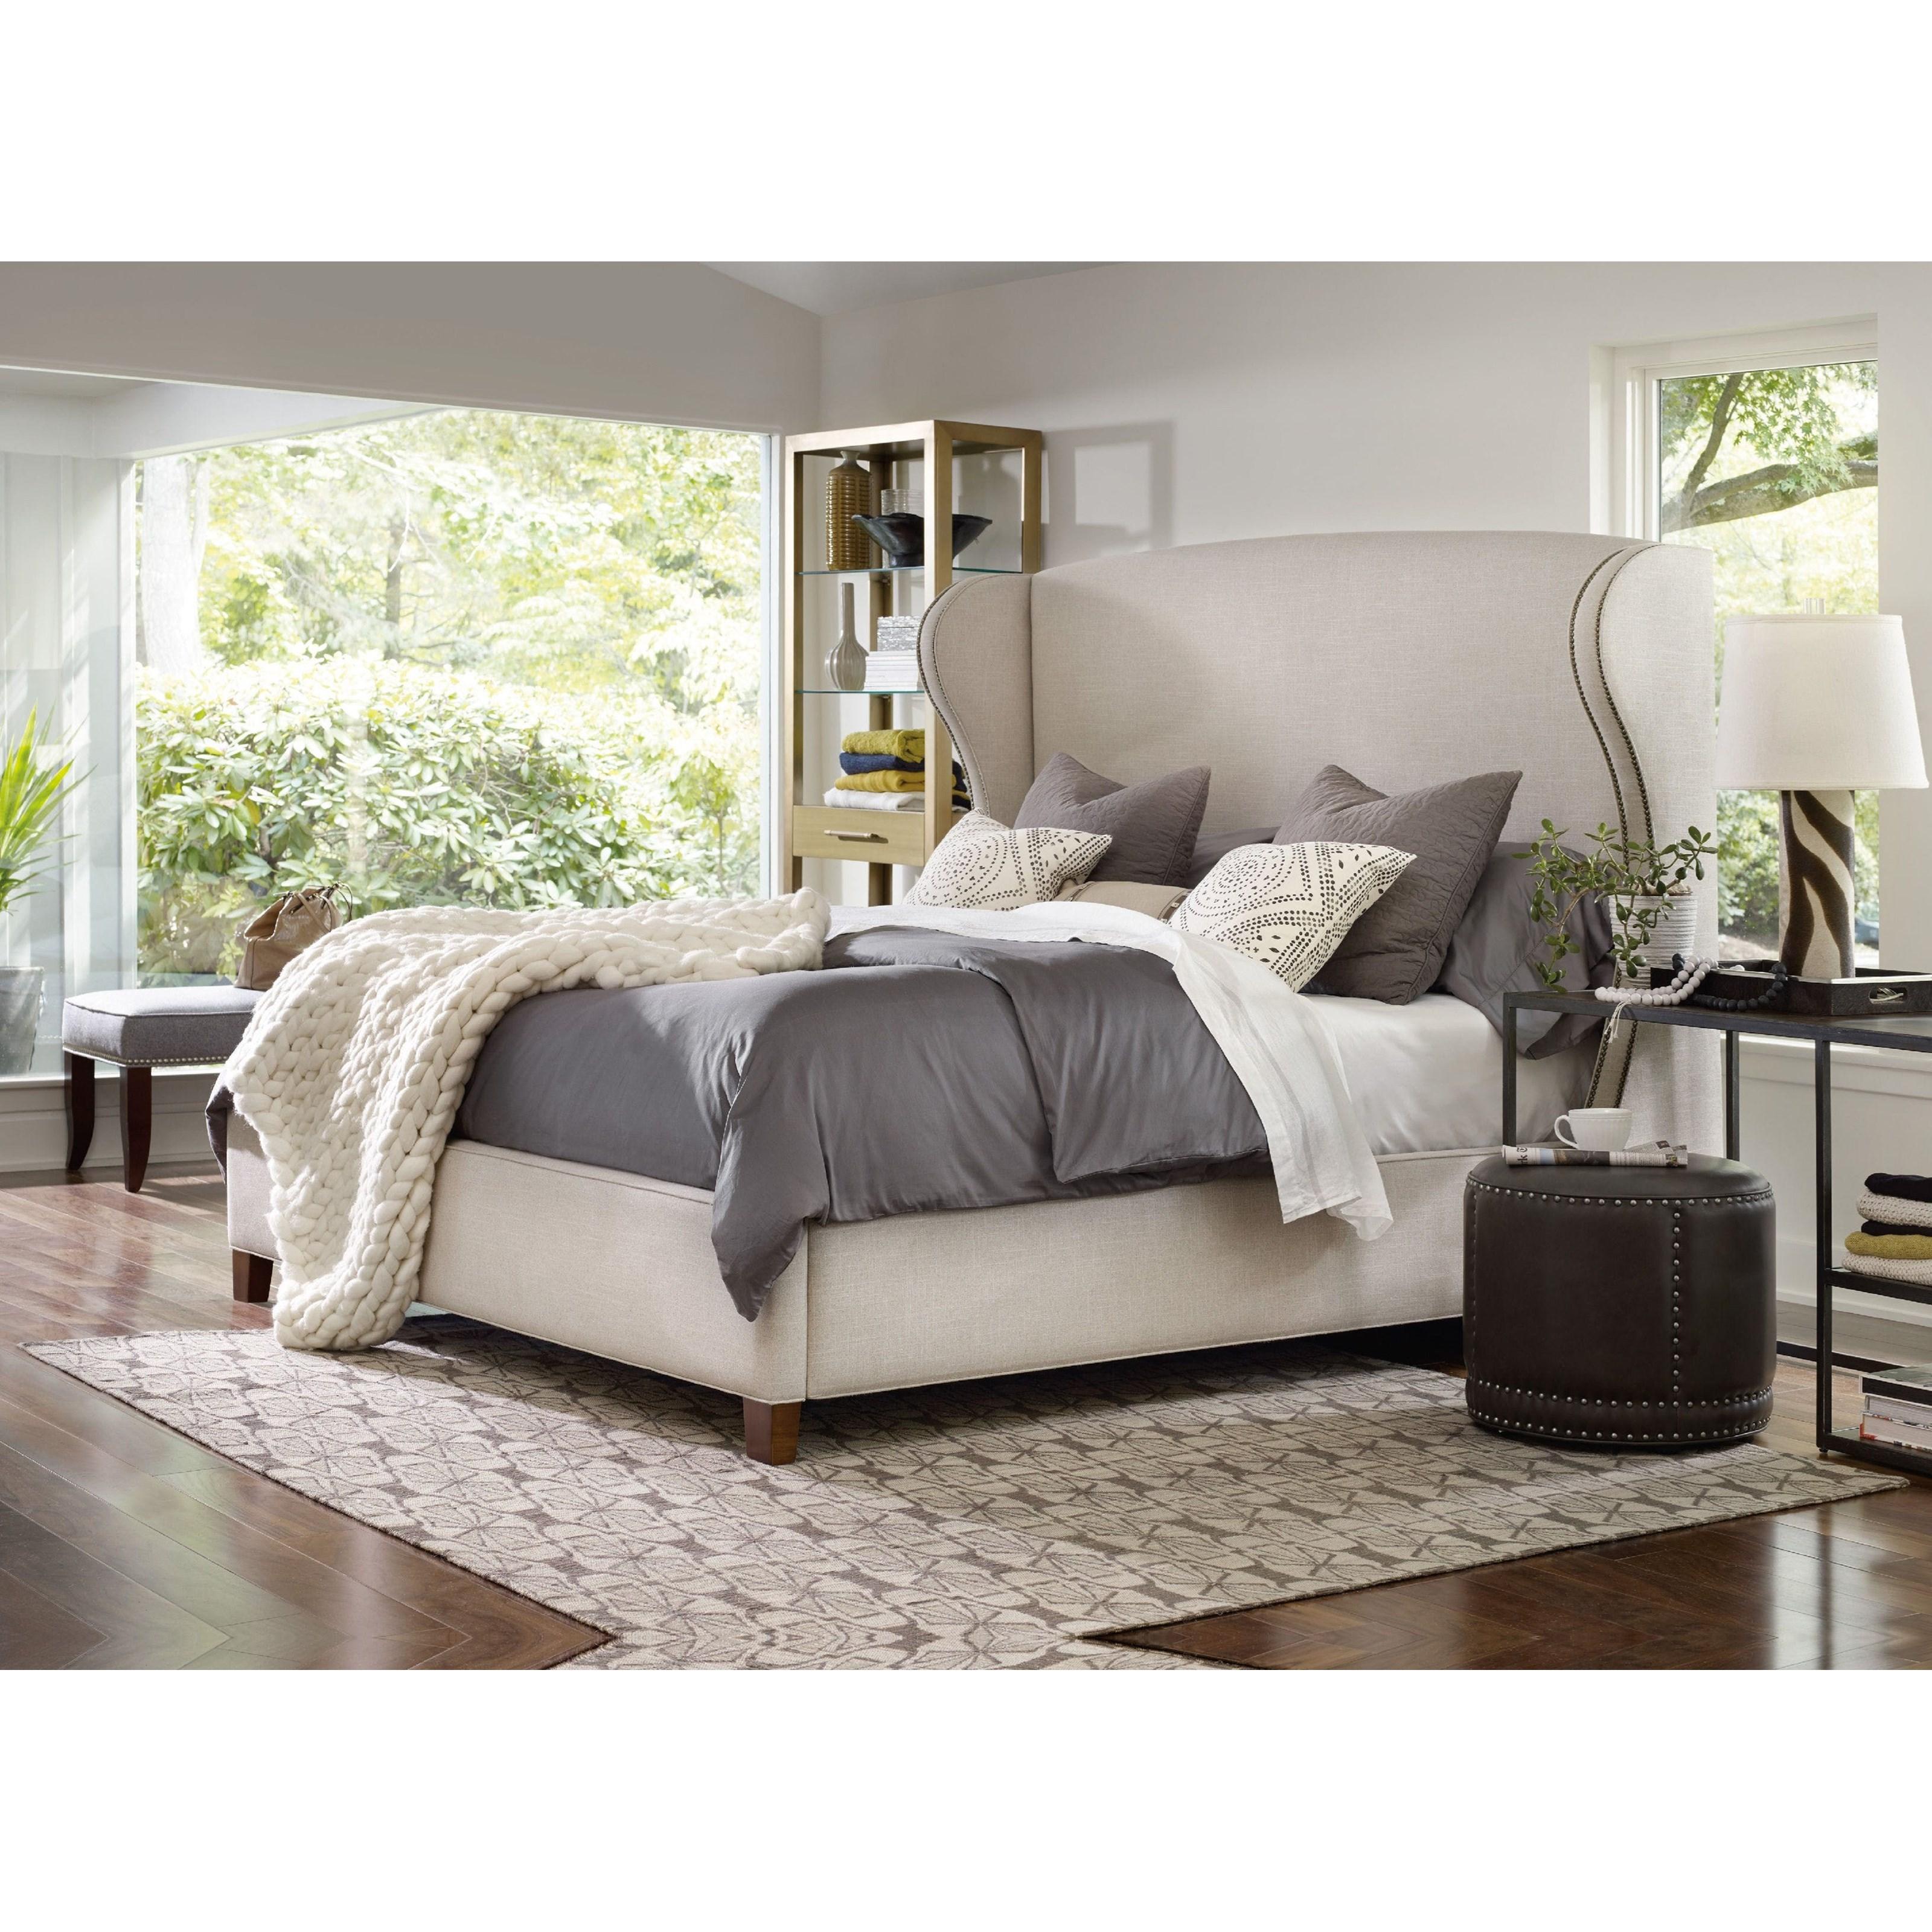 Hooker Furniture Nest Theory Heron 52in California King Upholstered Bed Jacksonville Furniture